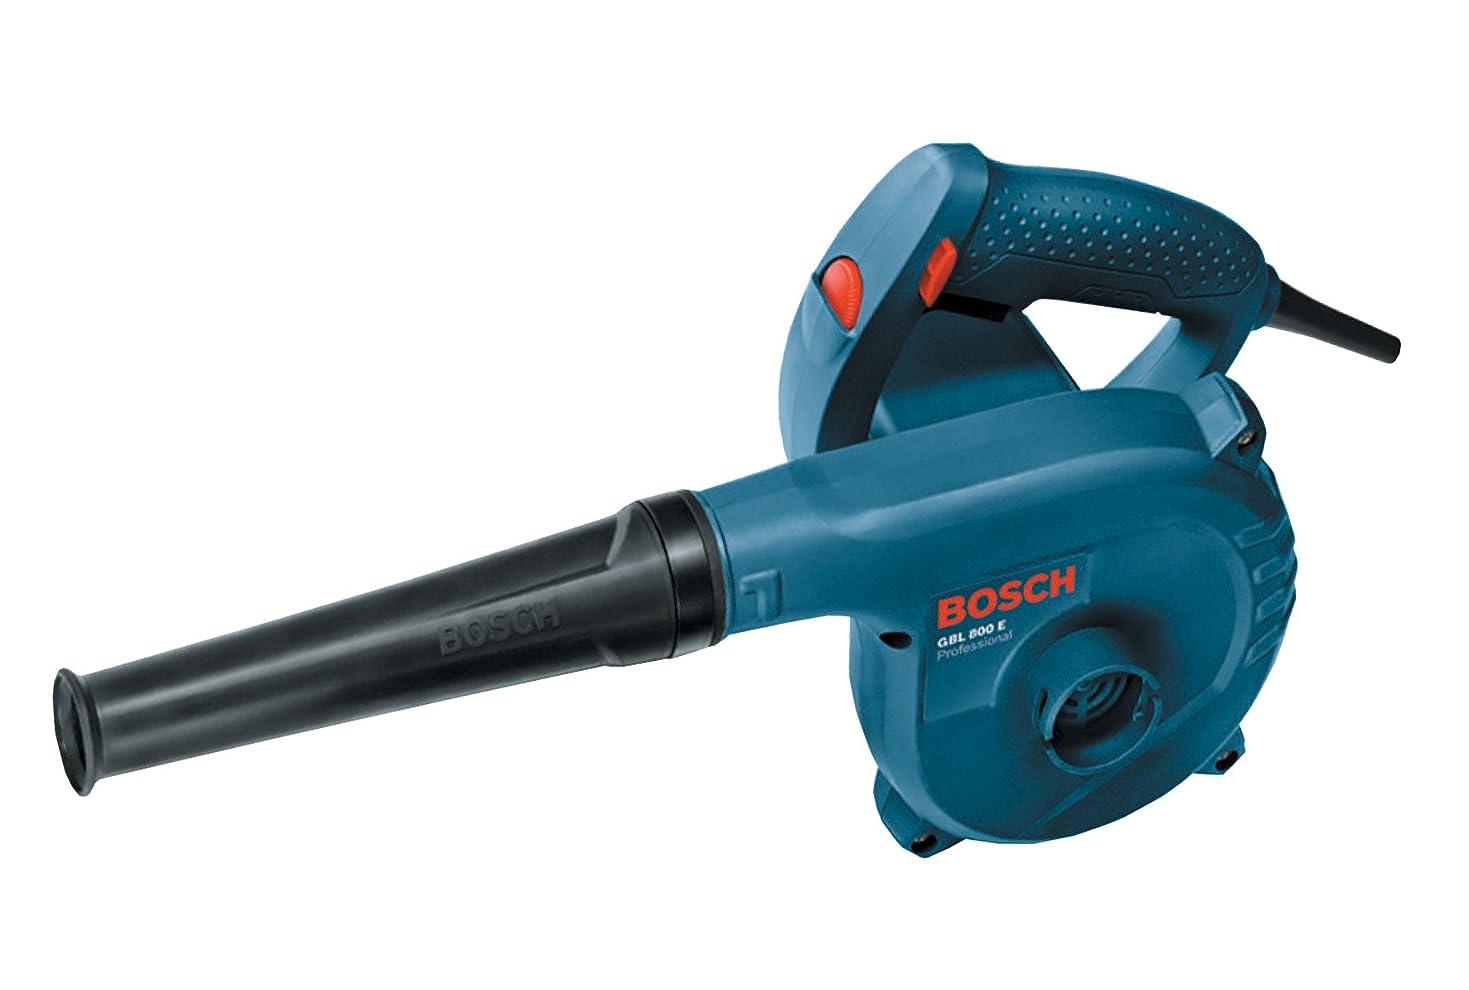 BOSCH(ボッシュ) ブロワ GBL800E